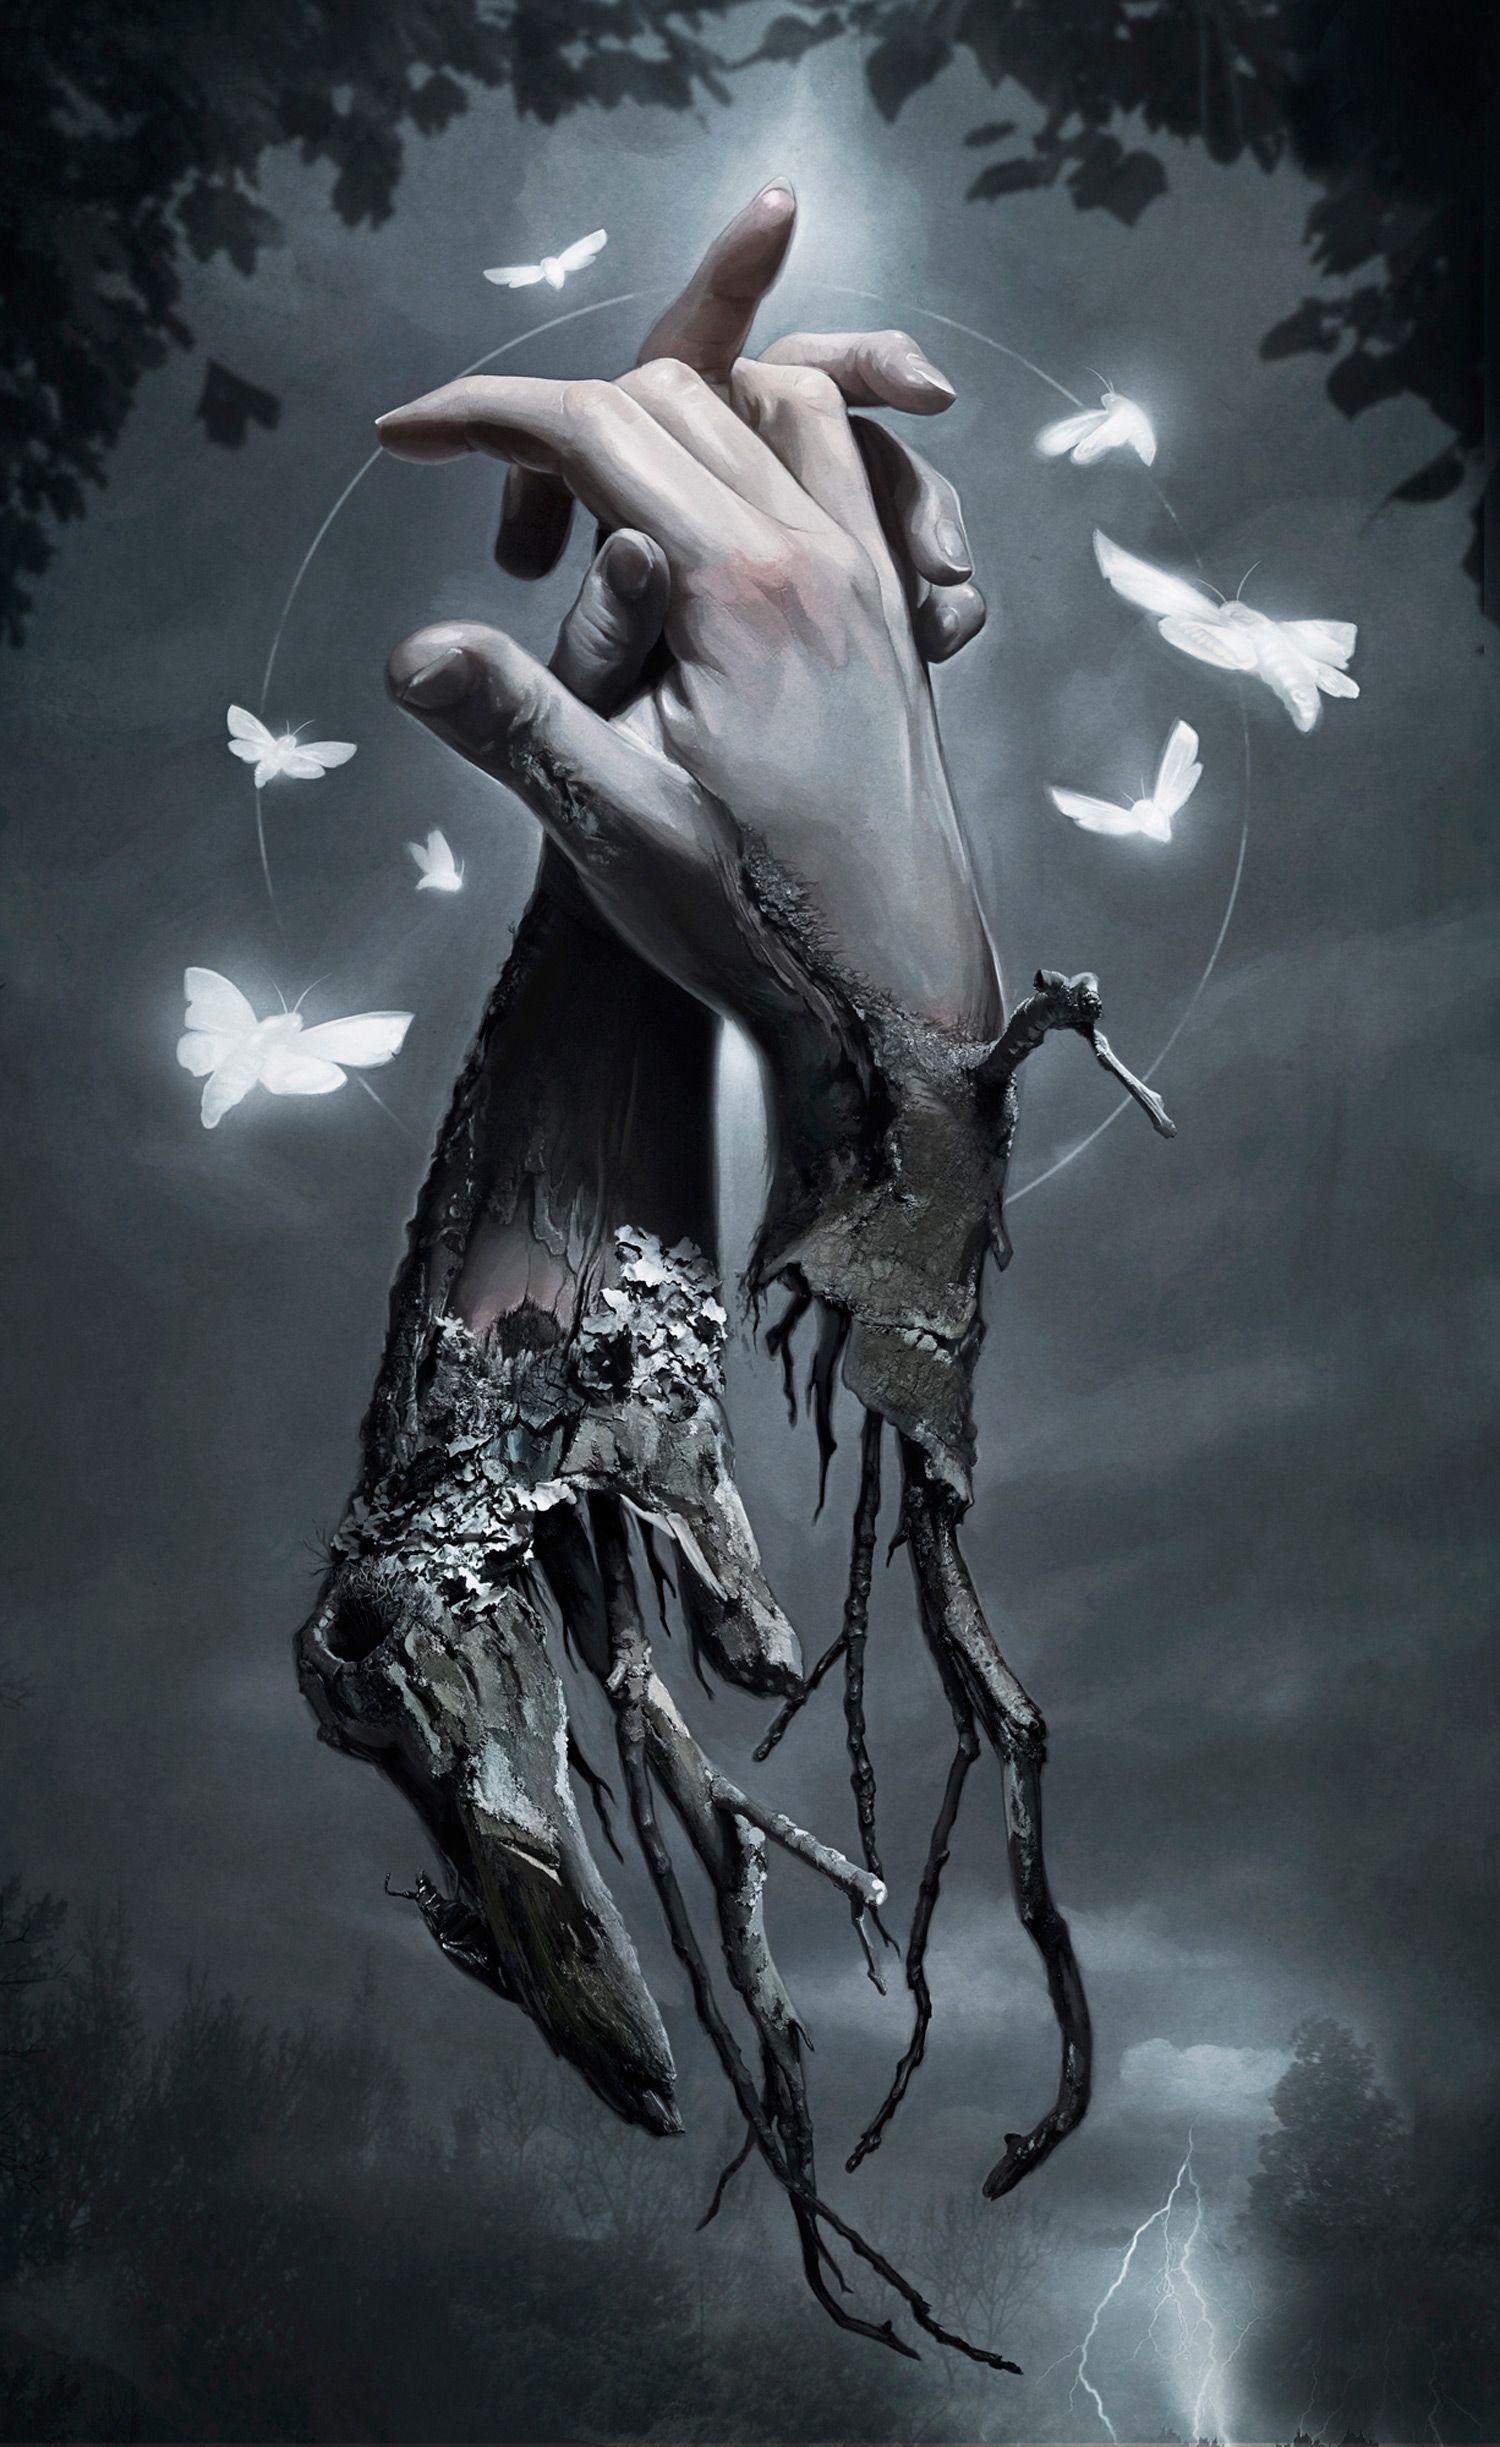 Macabre, Supernatural Digital Paintings by David Seidman